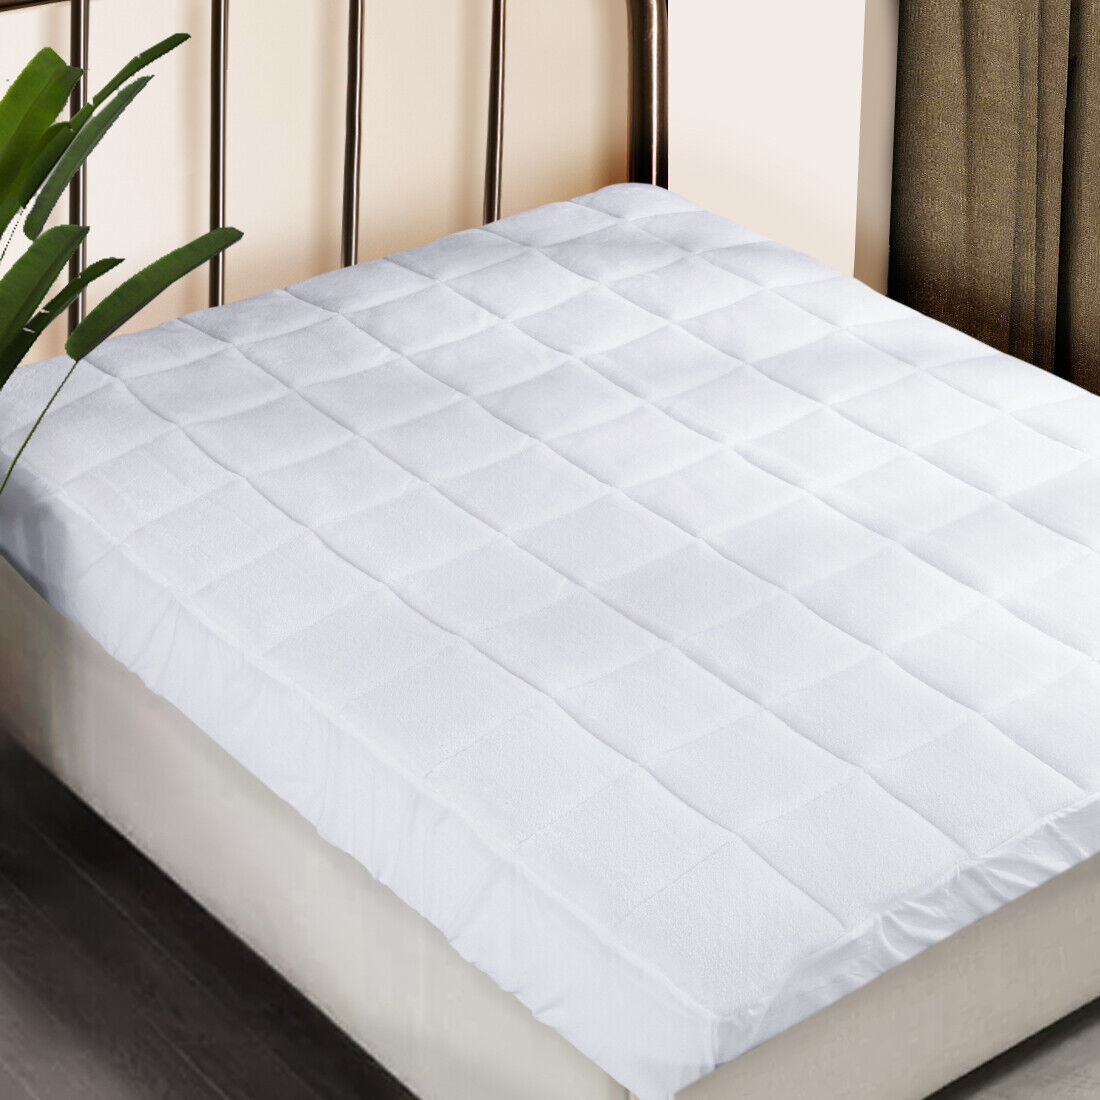 Puredown® Plush Mattress Pad Protector Bed Down Alternative